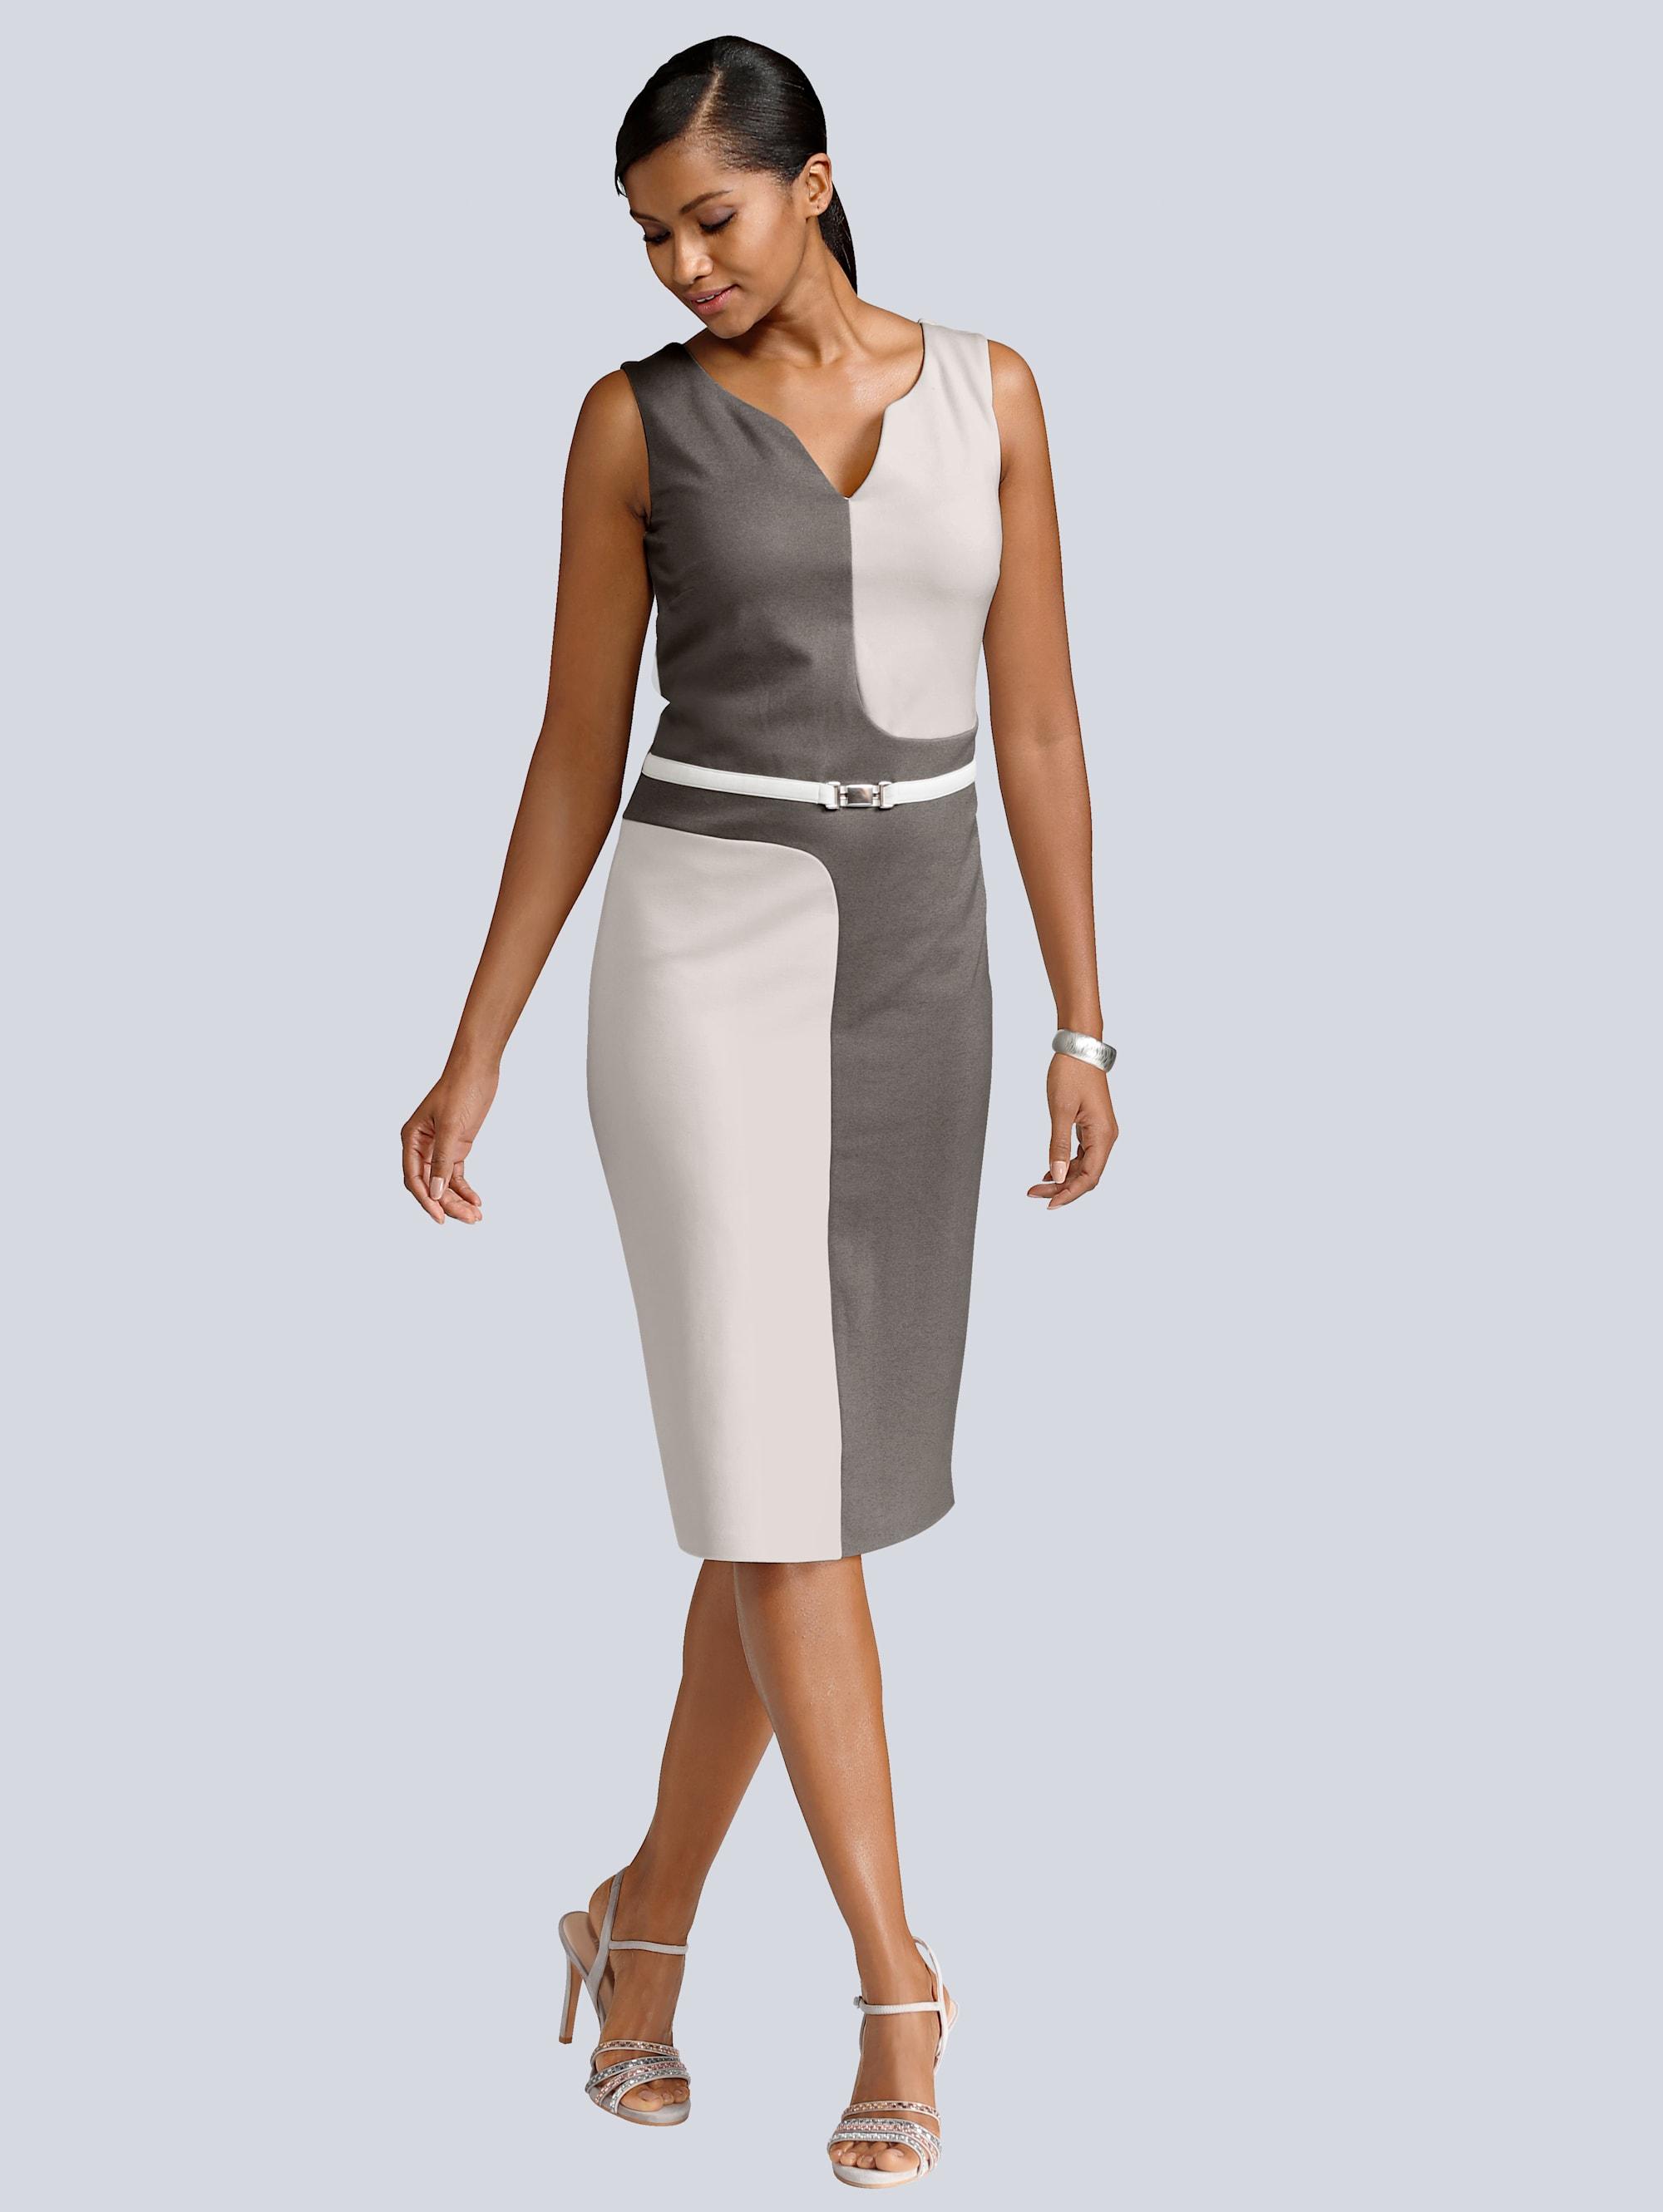 Alba Moda Kleid im aktuellen Colourblocking MJ3ZZ Fkwyh